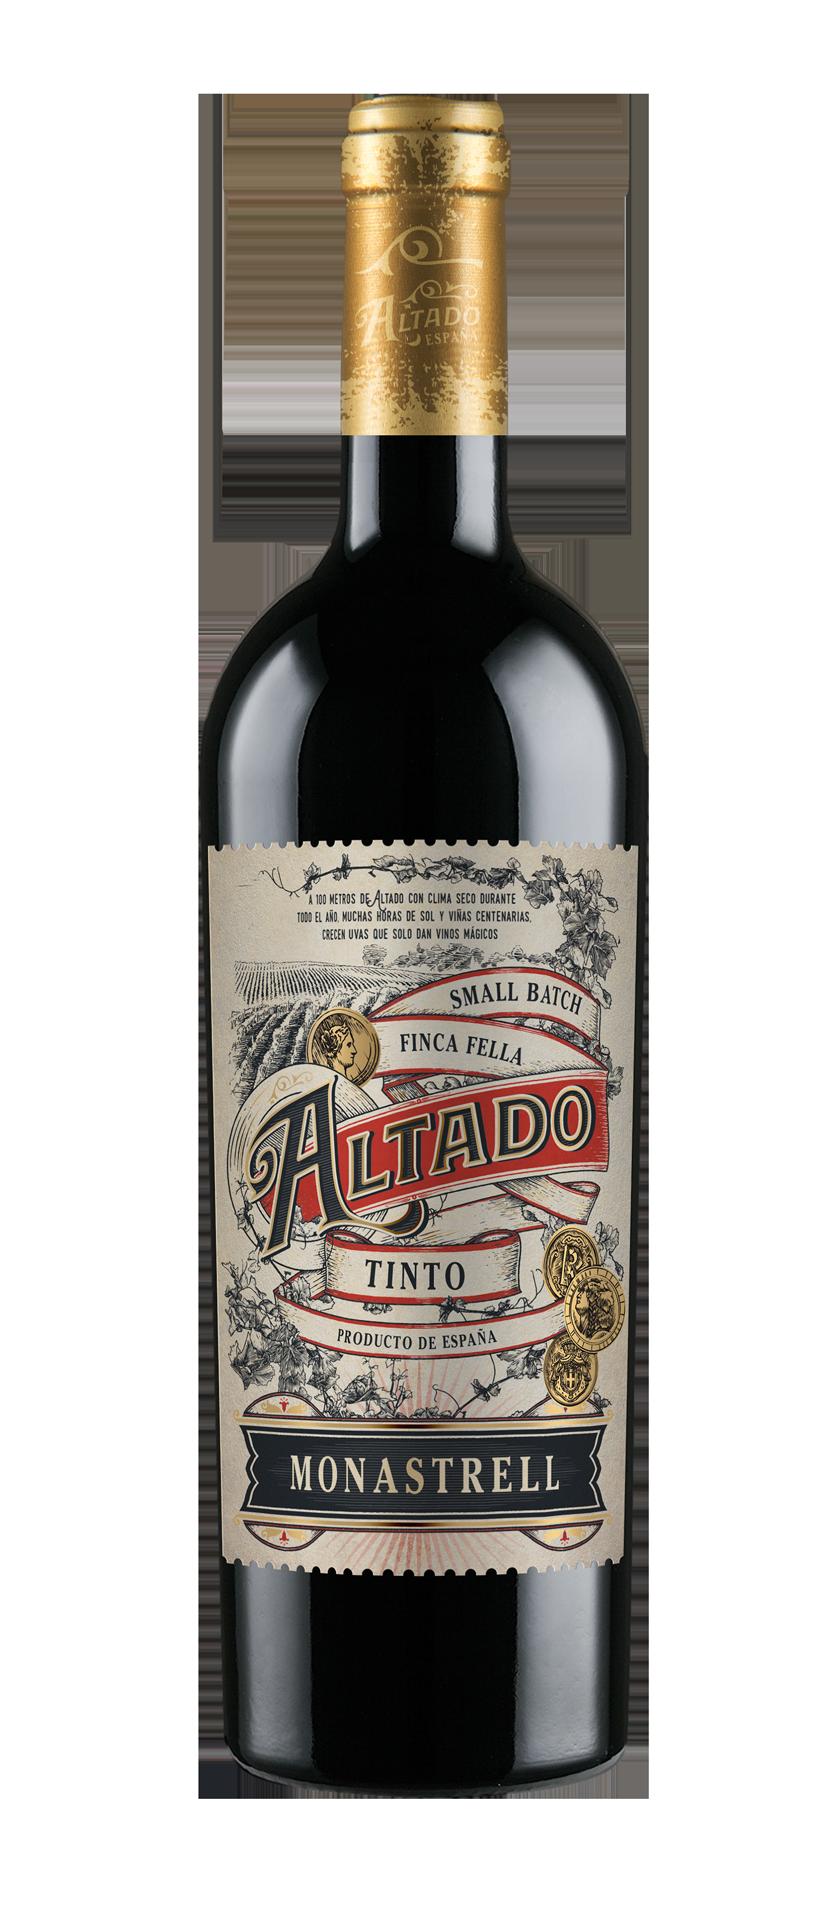 Altado_rosso_finish-2